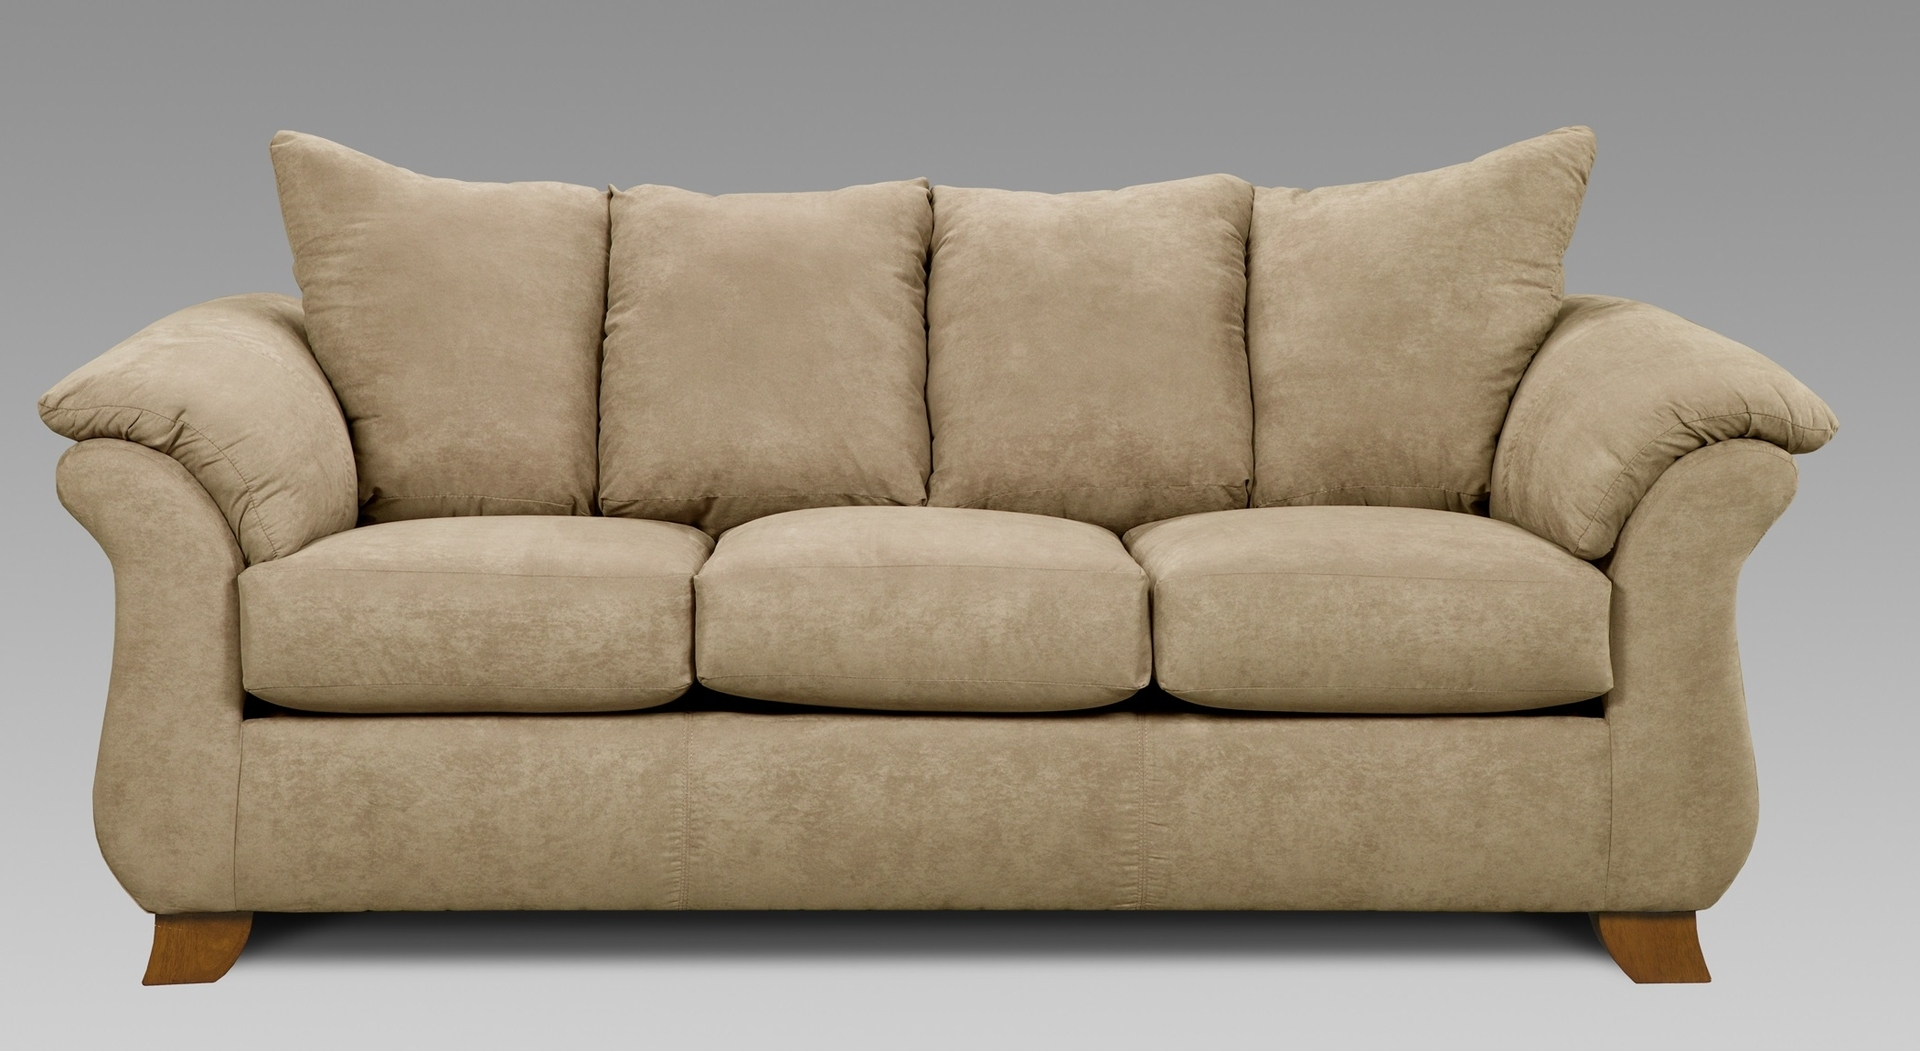 Tuscaloosa Sectional Sofas Inside Well Known Sofas: Tuscaloosa, Al: Southeastern Furniture (View 9 of 15)